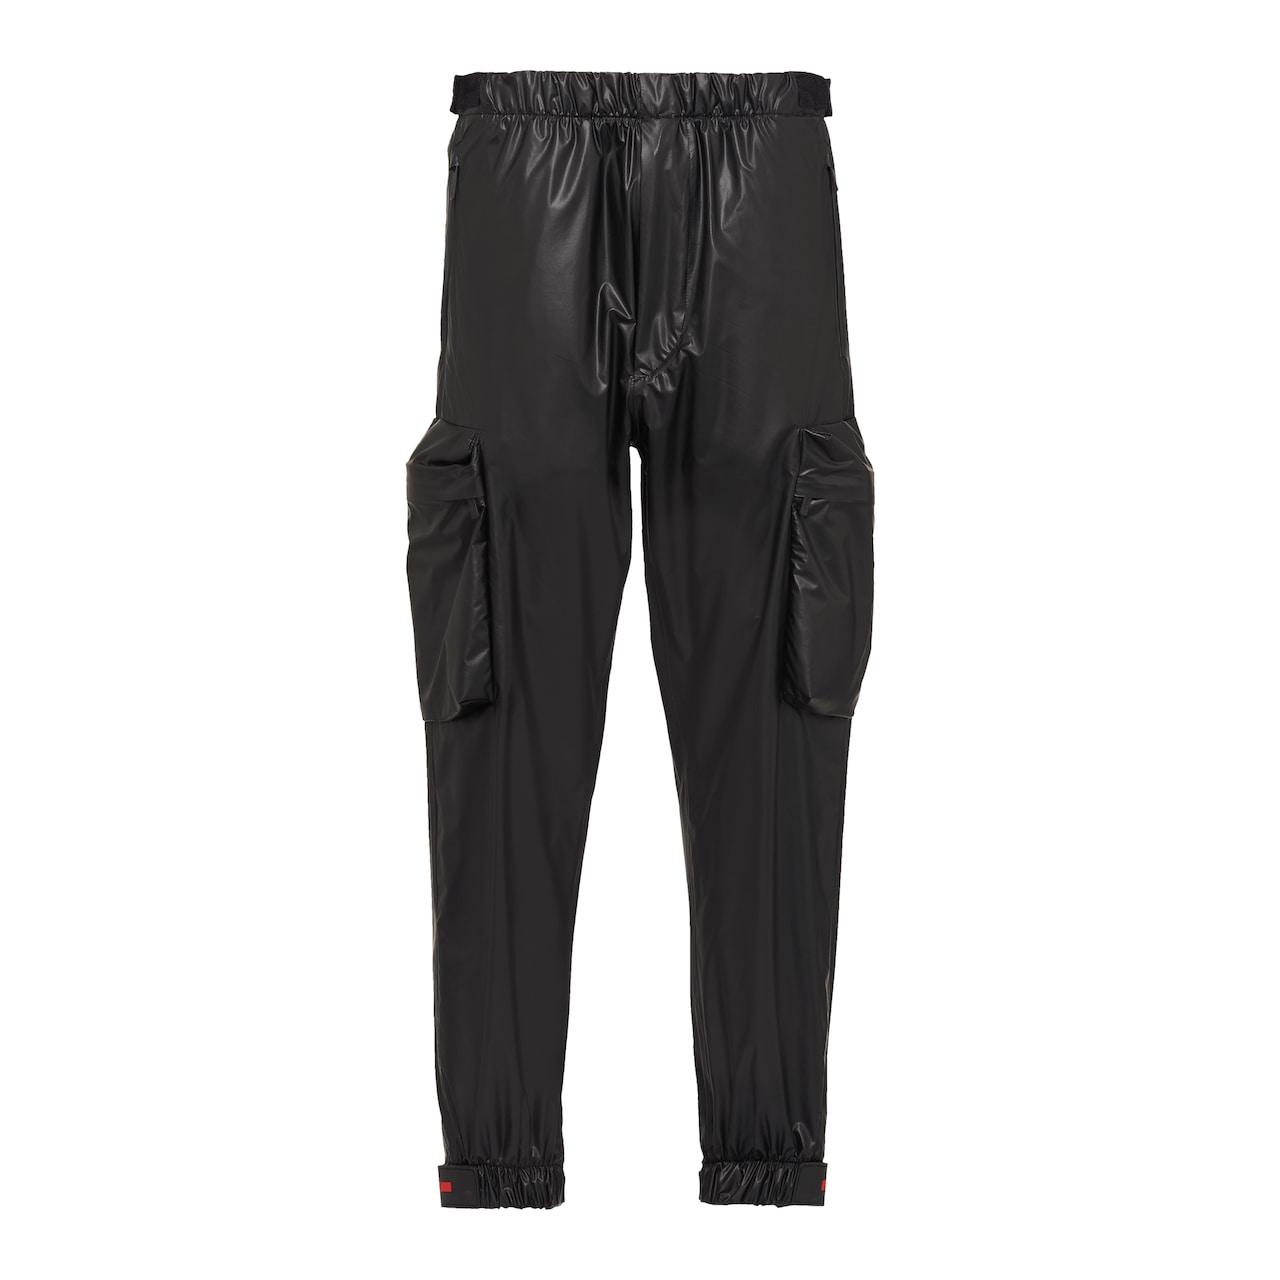 Prada LR-LX025 nylon pants 1